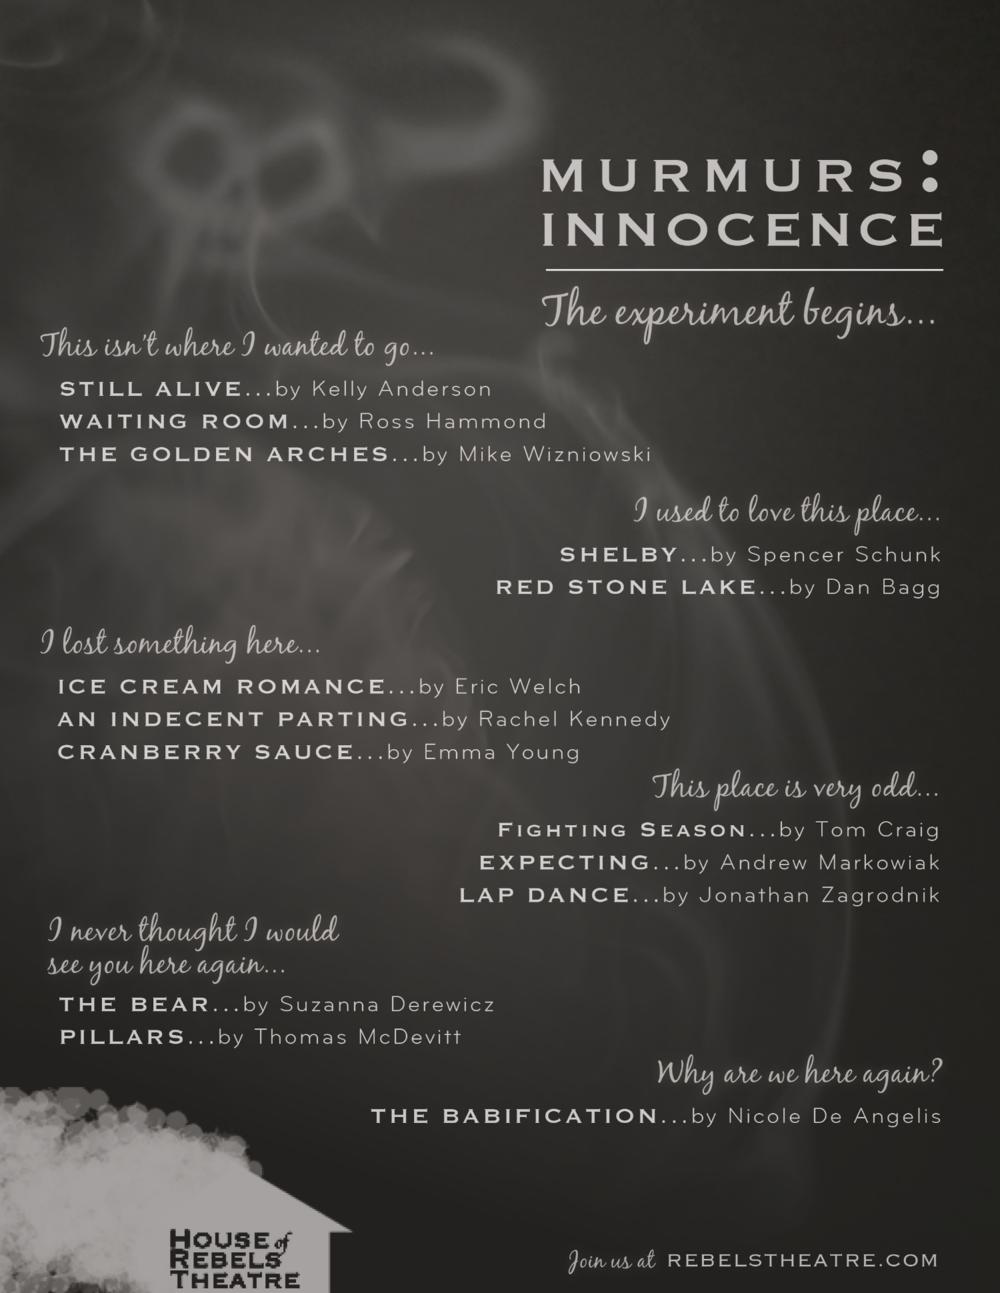 Murmurs_teaser-poster_R1.jpg